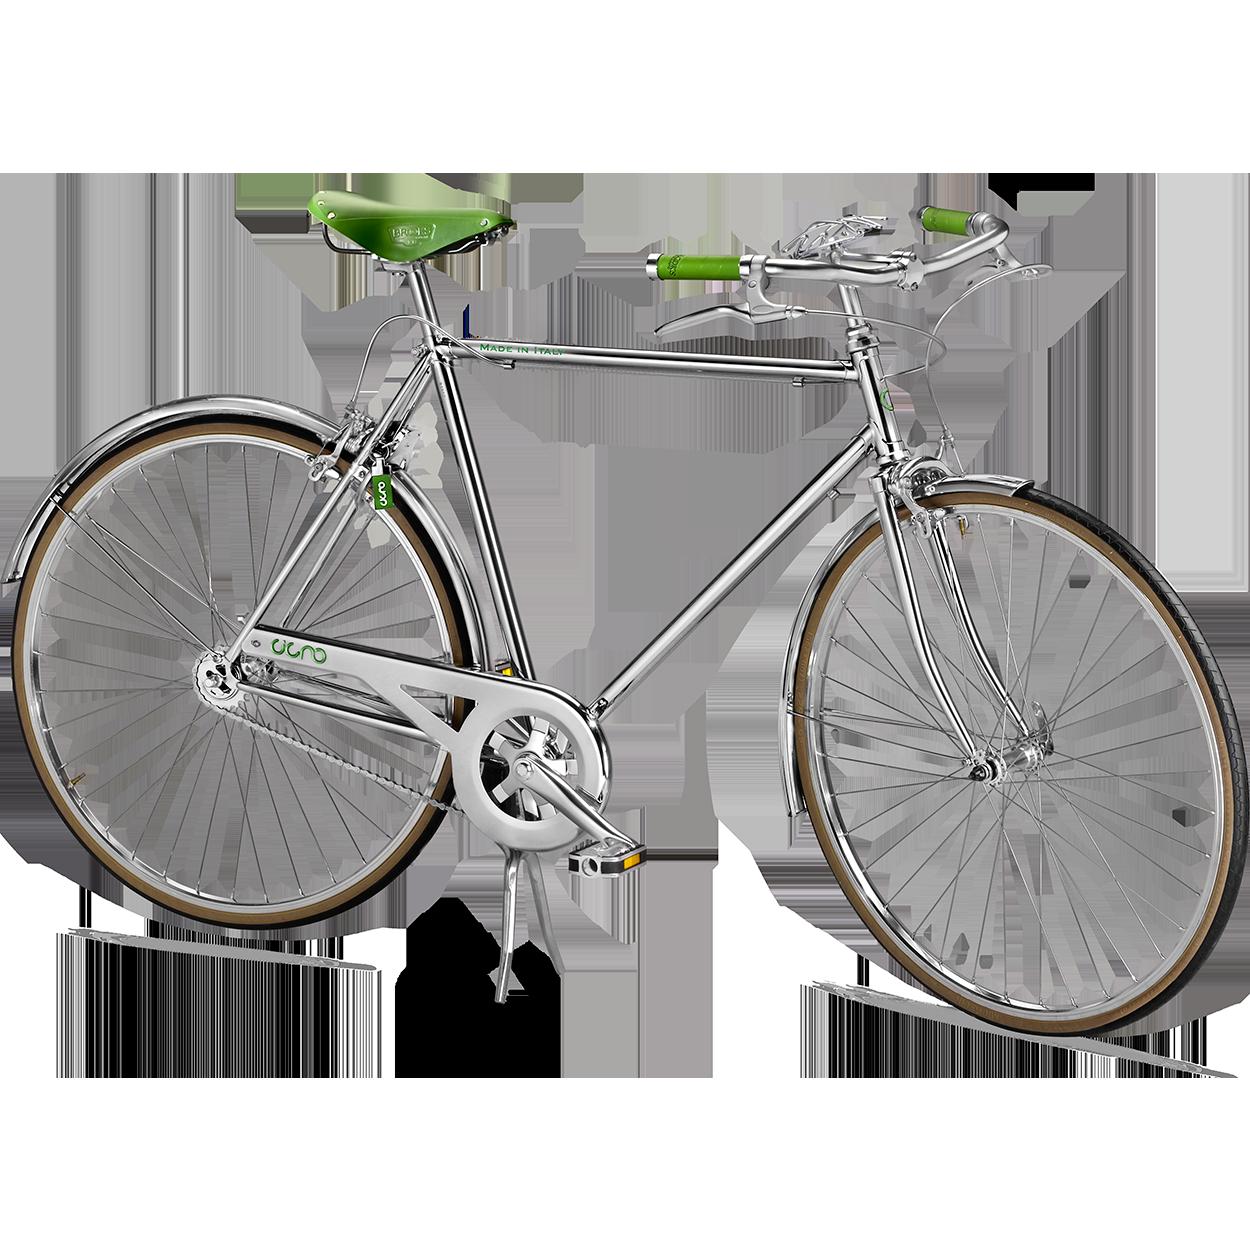 Cigno-Uomo-Classic-Verde-2017